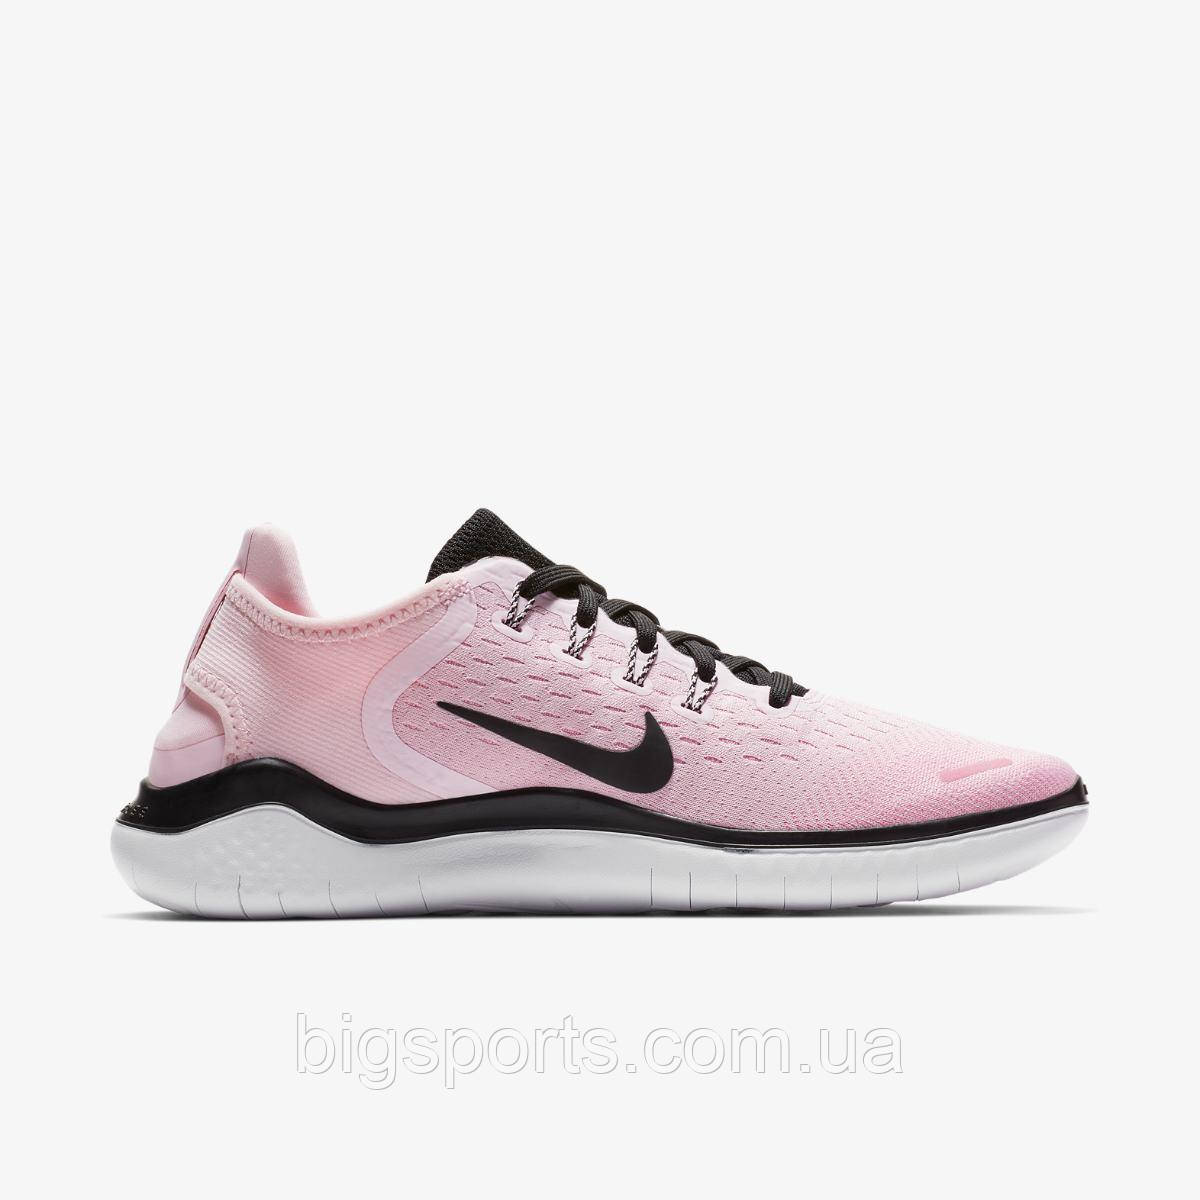 Кроссовки жен. Nike Wmns Free Rn 2018 (арт. 942837-603)